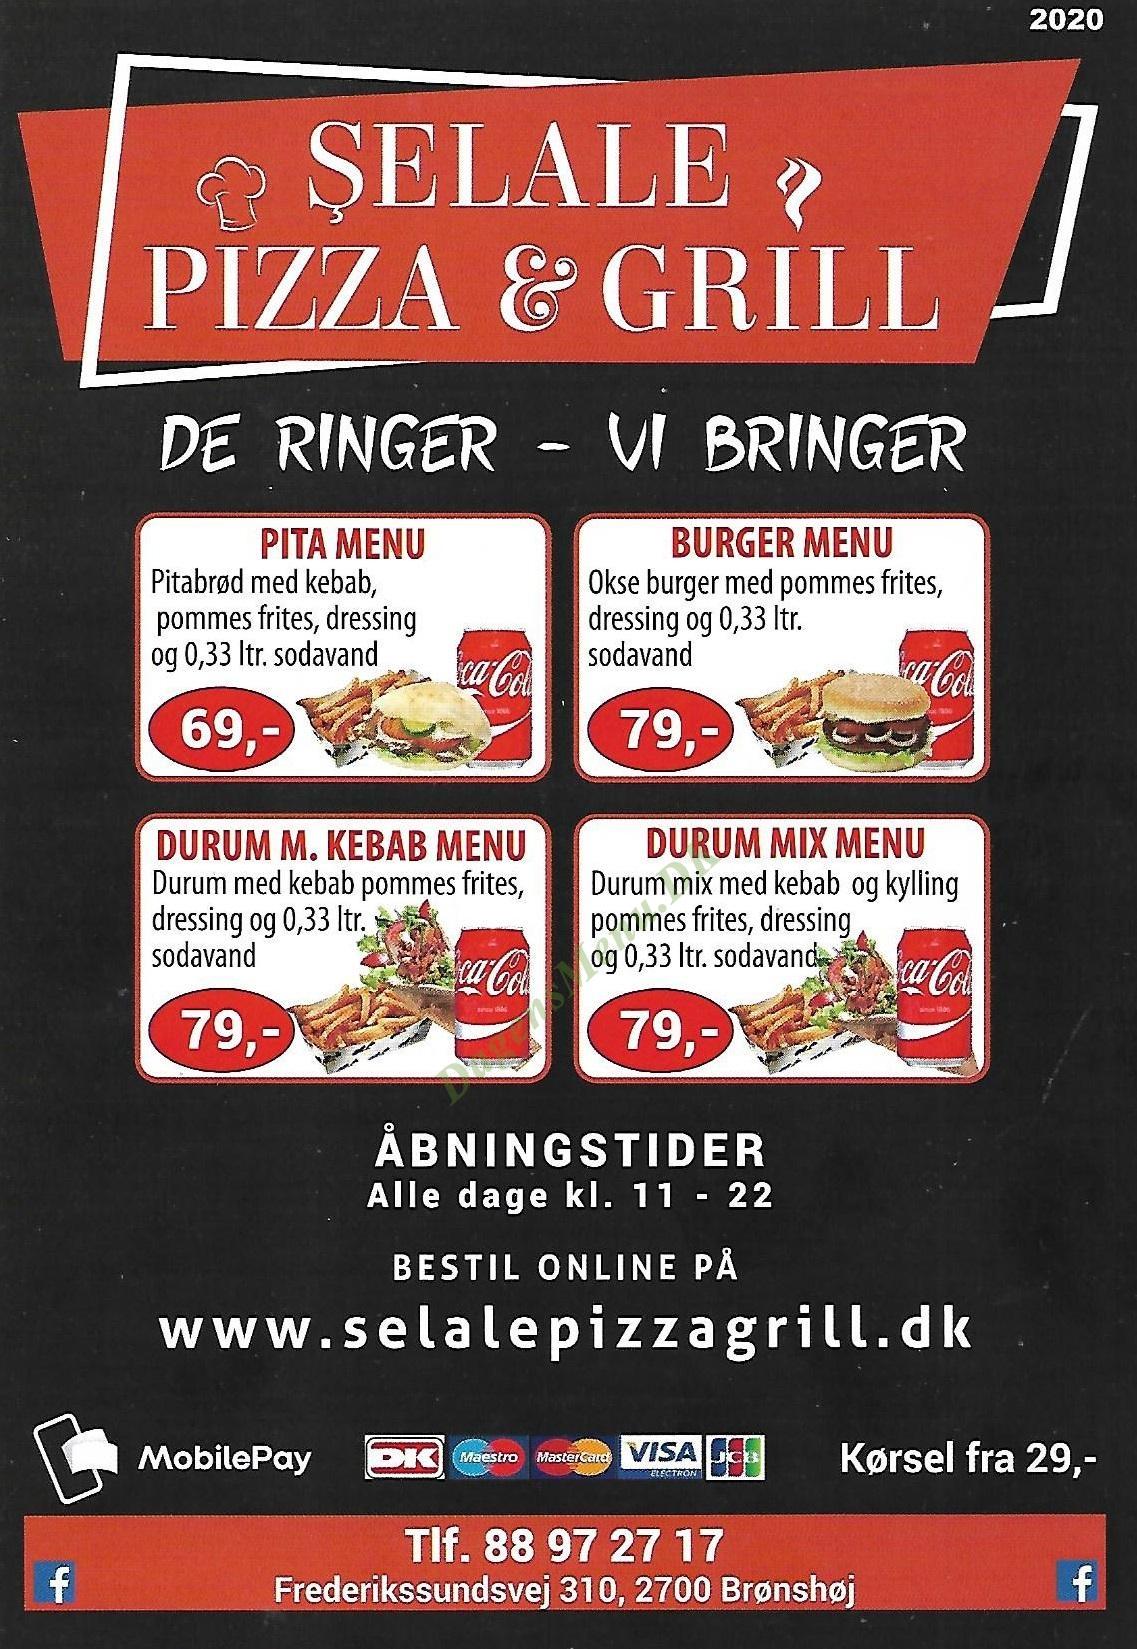 Selale Pizza & Grill - Menukort